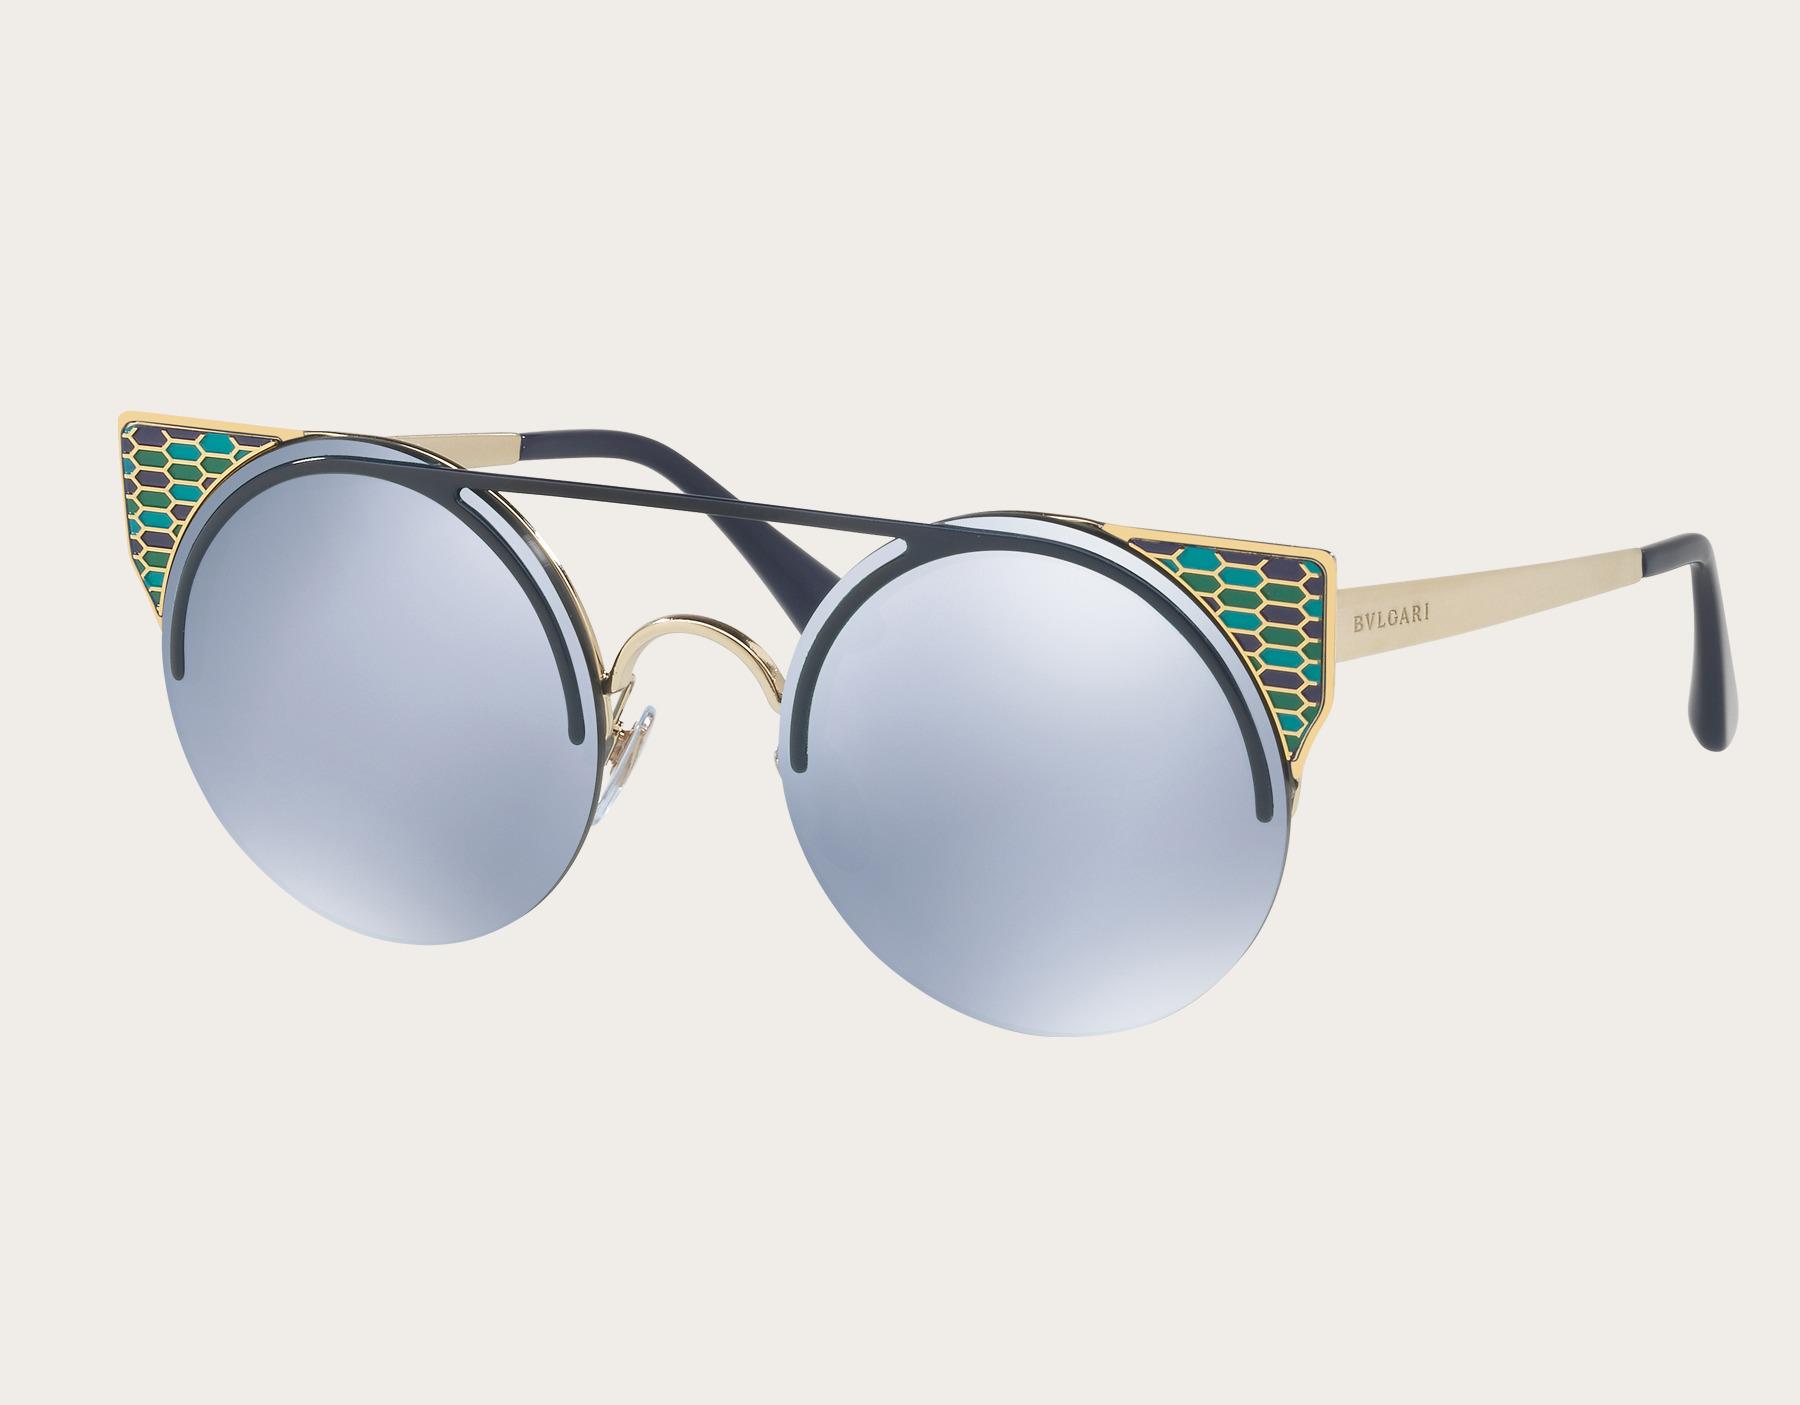 Serpenti-Sunglasses-BVLGARI-903239-E-1.jpg